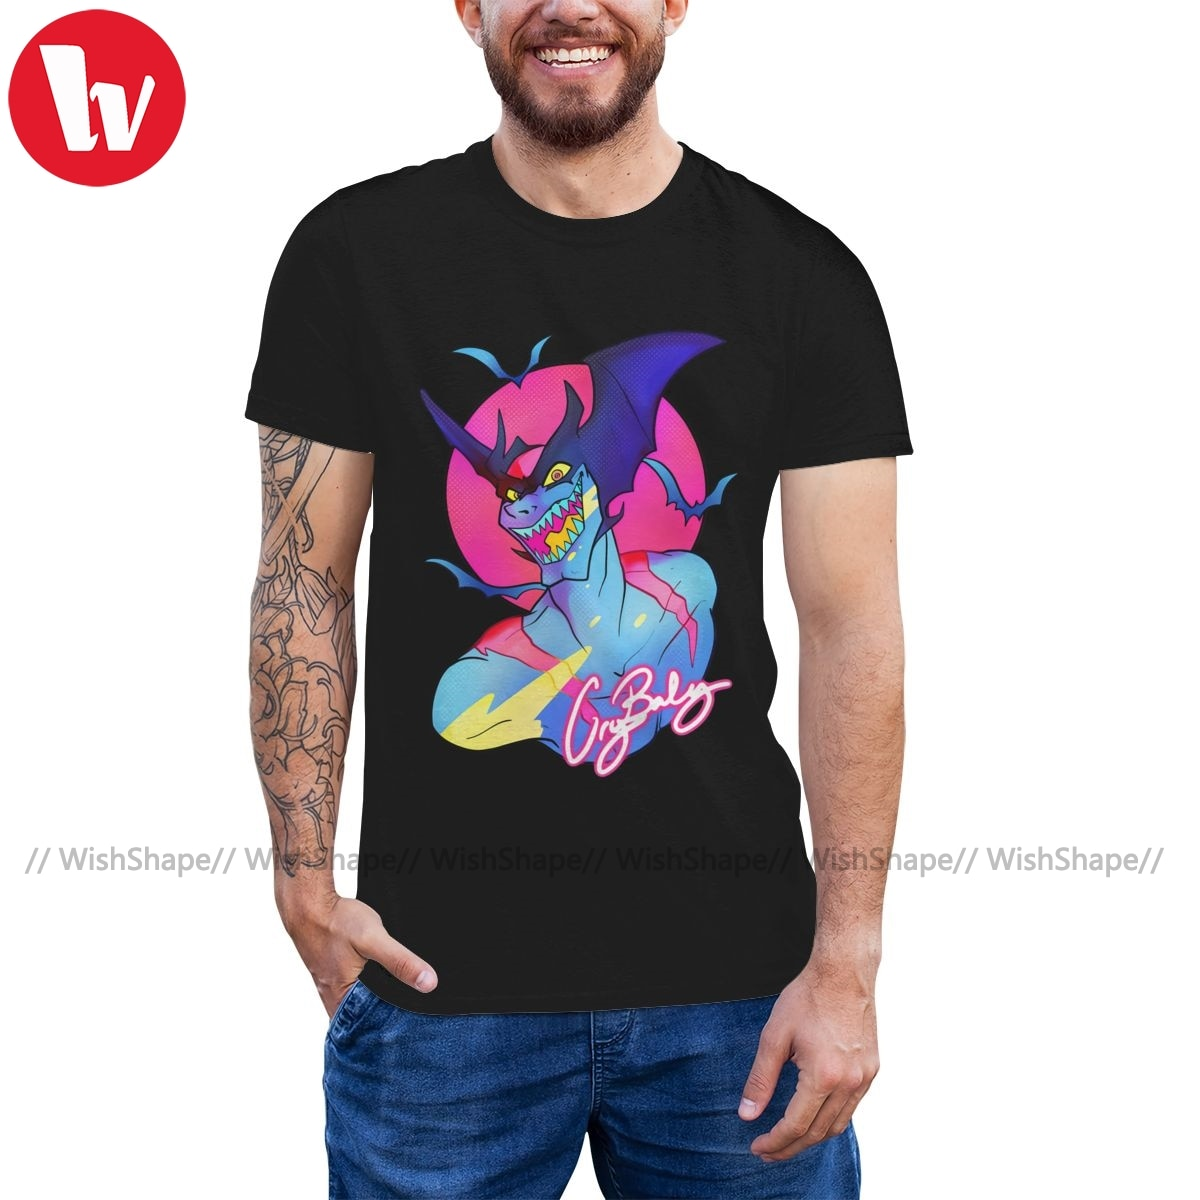 Camiseta Devilman, camiseta CRYBABY DEVILMAN, camiseta de playa impresionante, camiseta de manga corta de gran tamaño